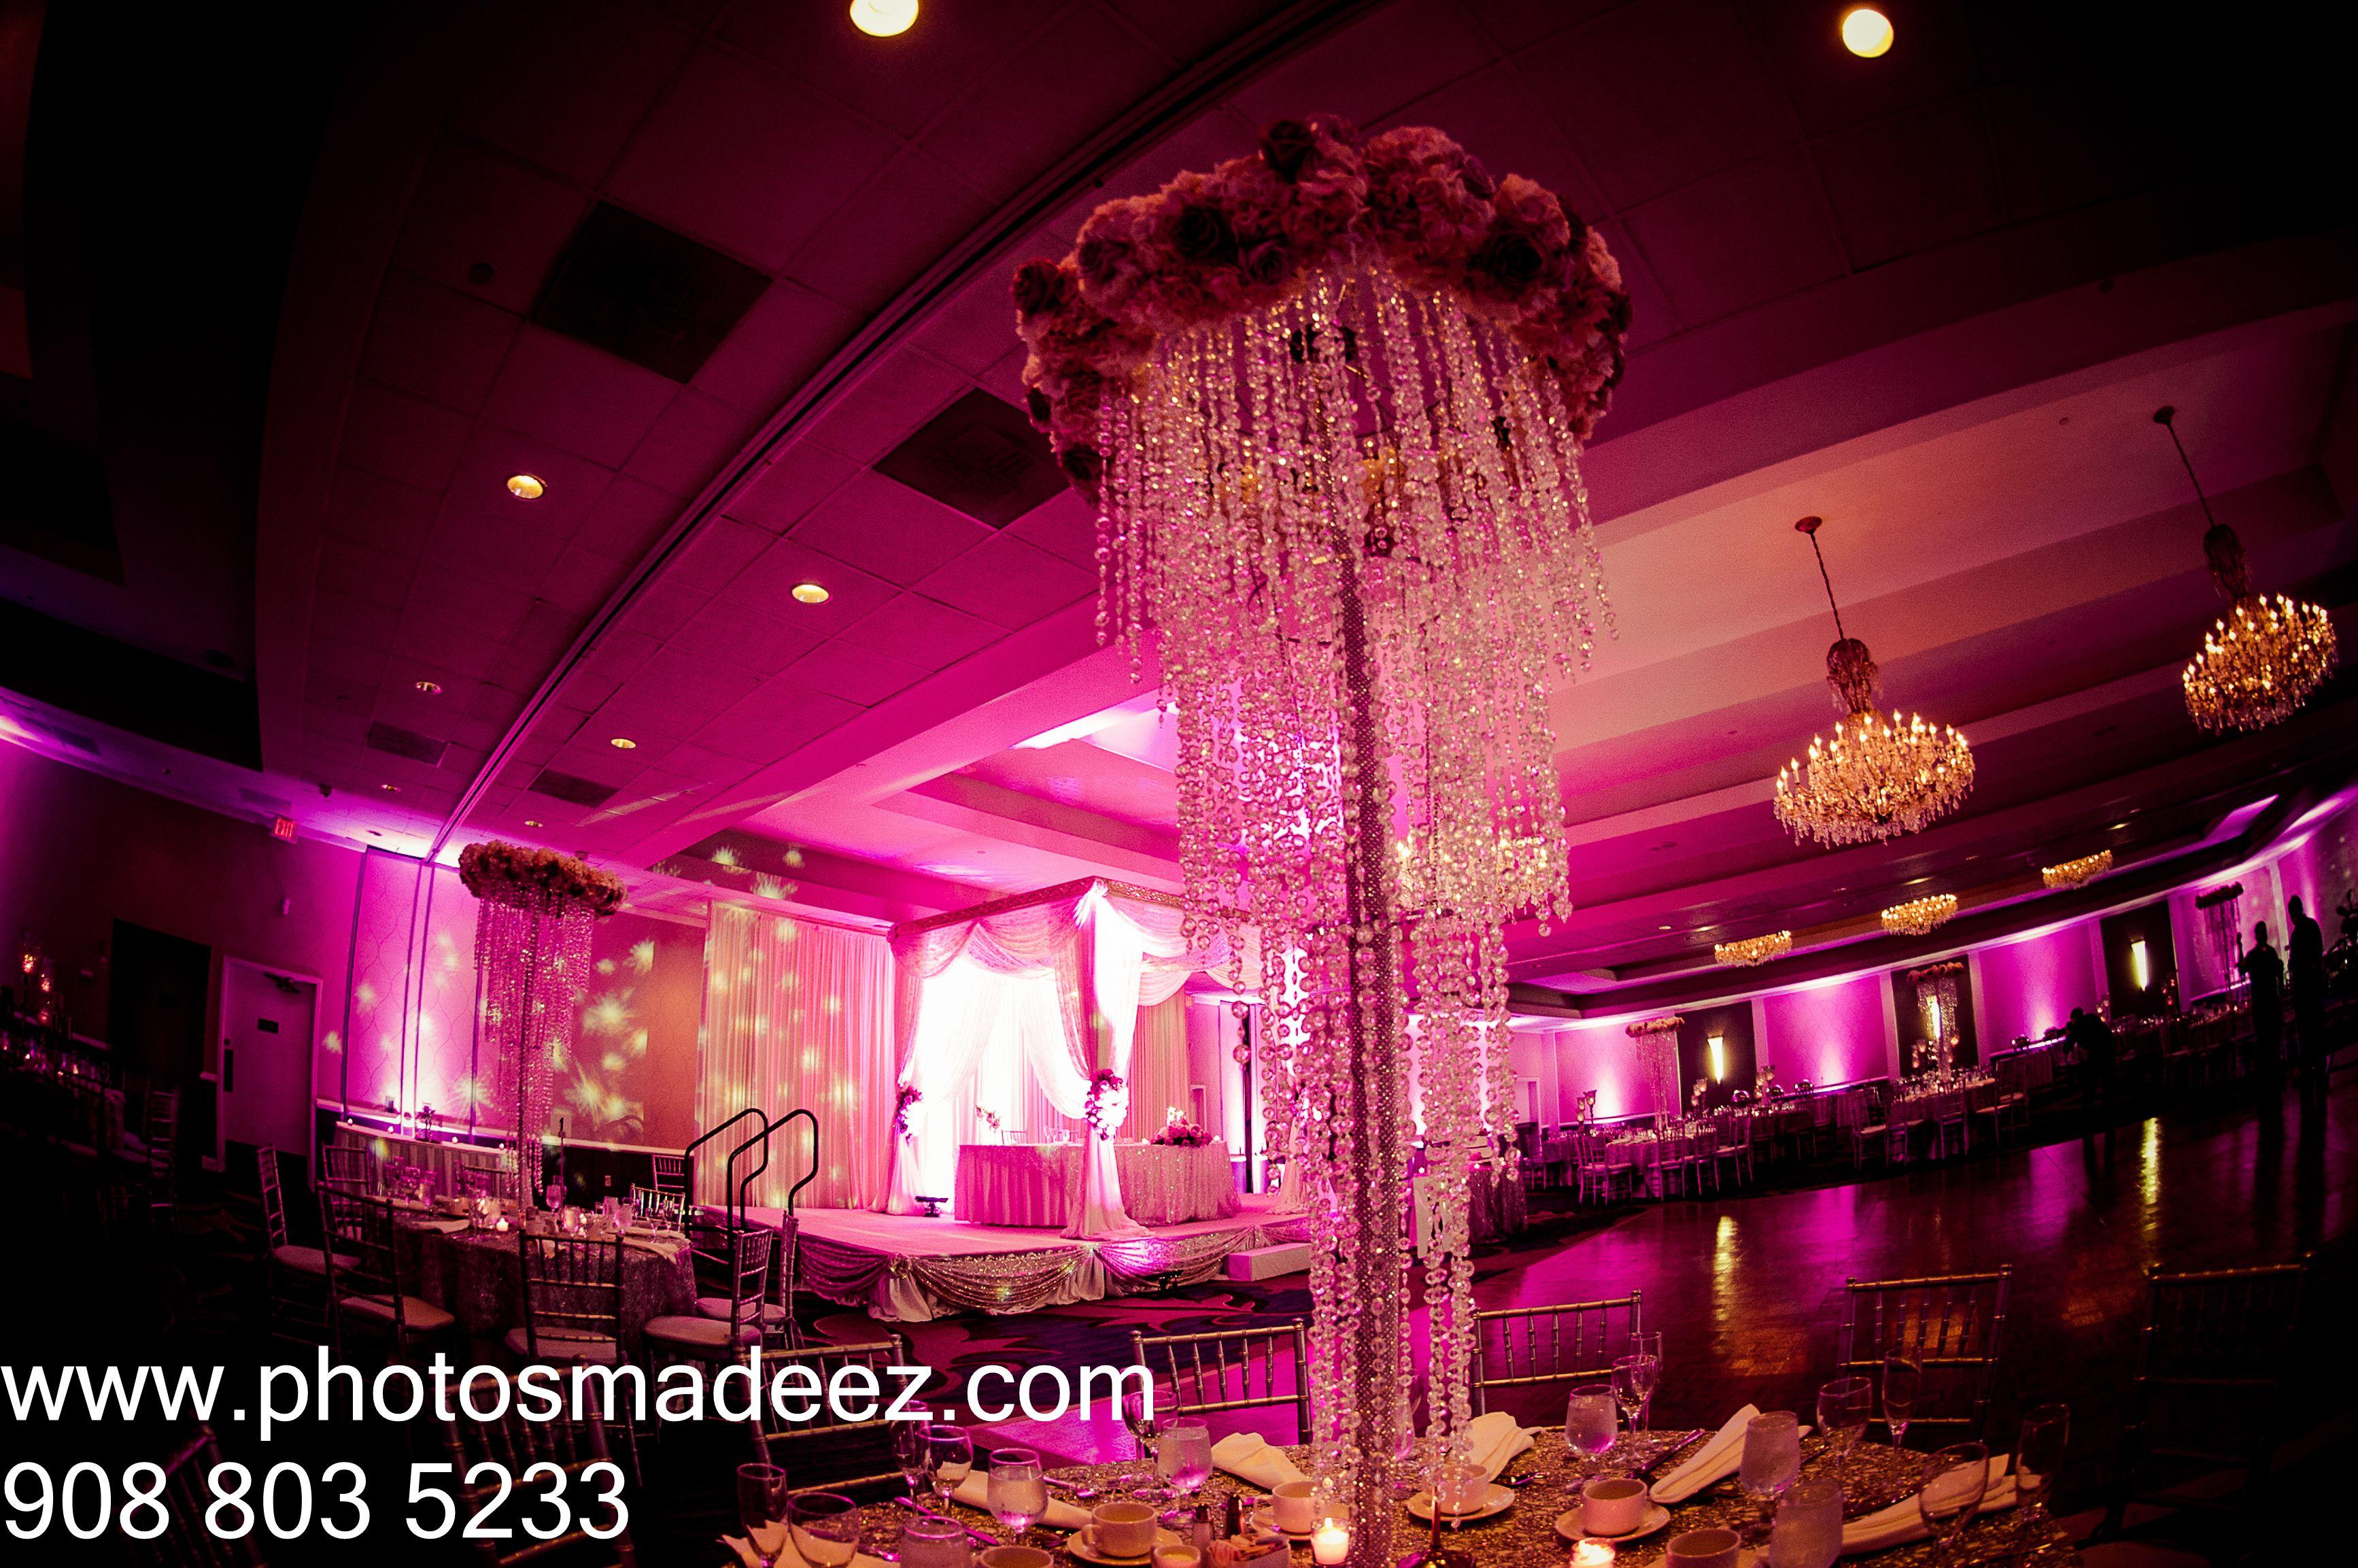 Wedding Decor At Indian Reception Sheraton Parsippany NJ Punjabi In New